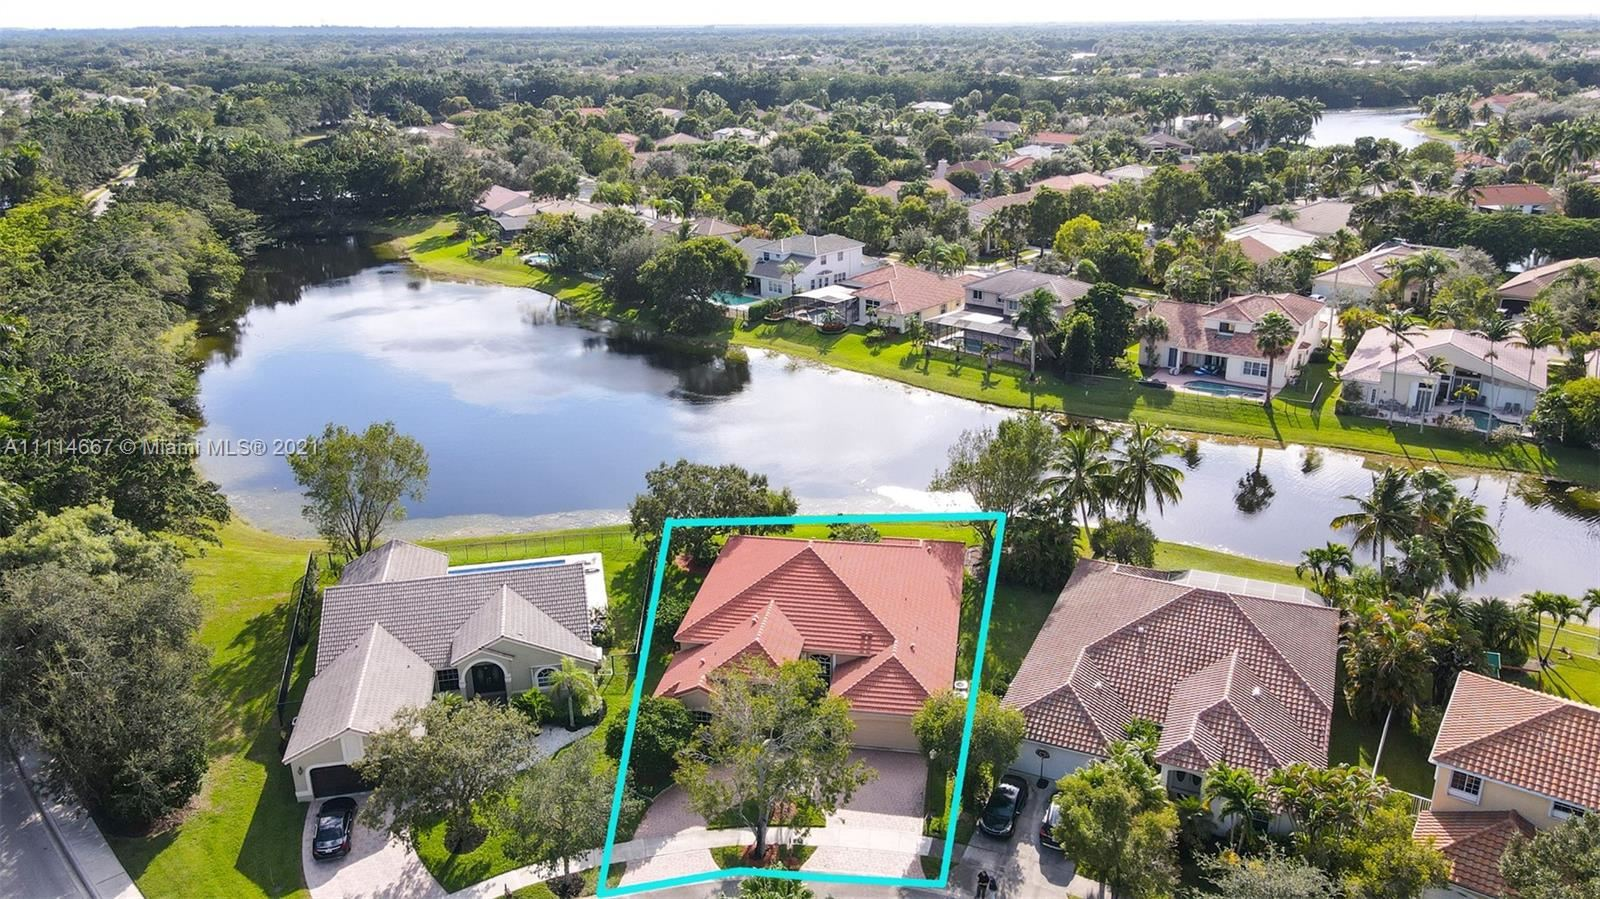 Photo of 607 Lake Blvd, Weston, FL 33326 (MLS # A11114667)